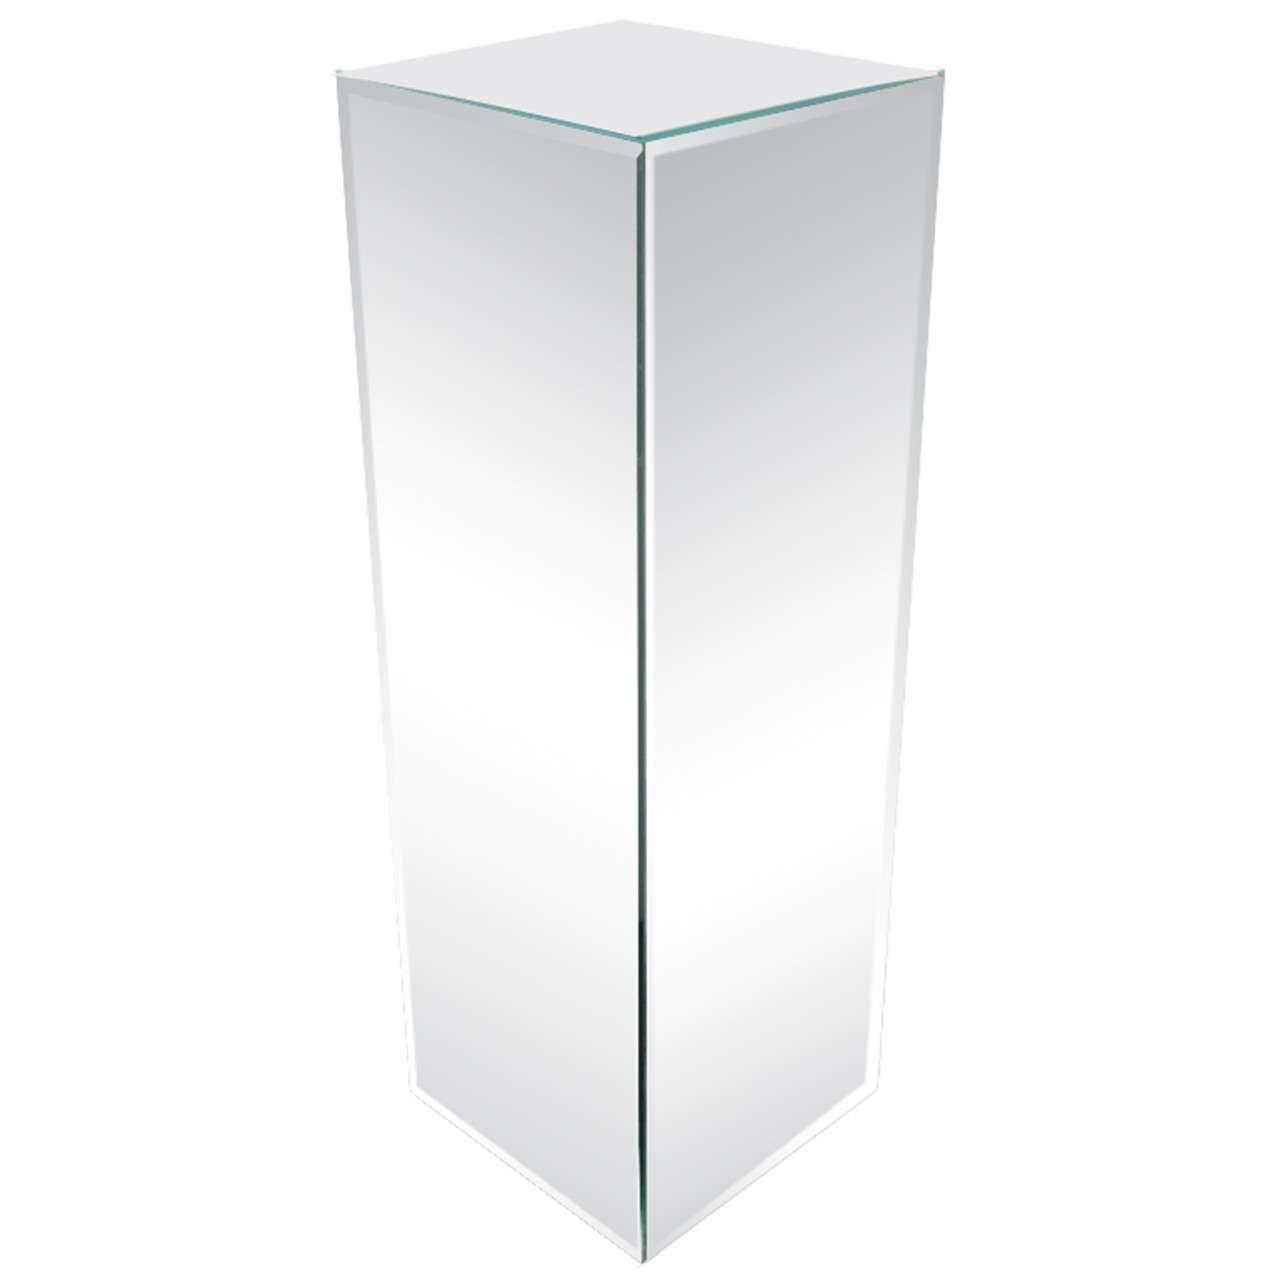 Modernist Hand Beveled Mirrored Pedestal For